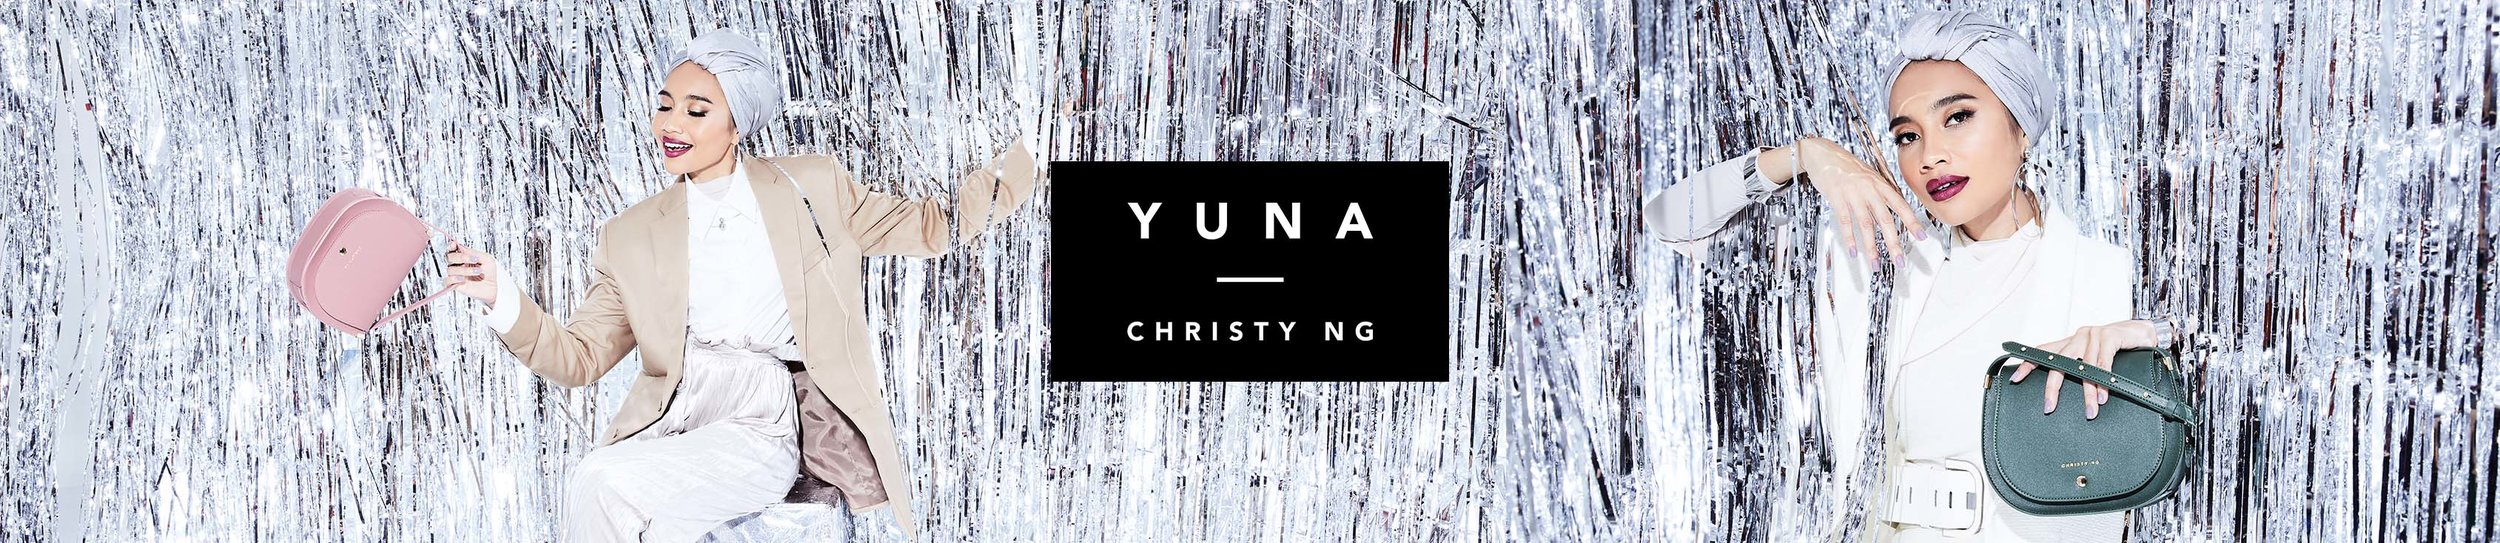 category banner yuna.jpg